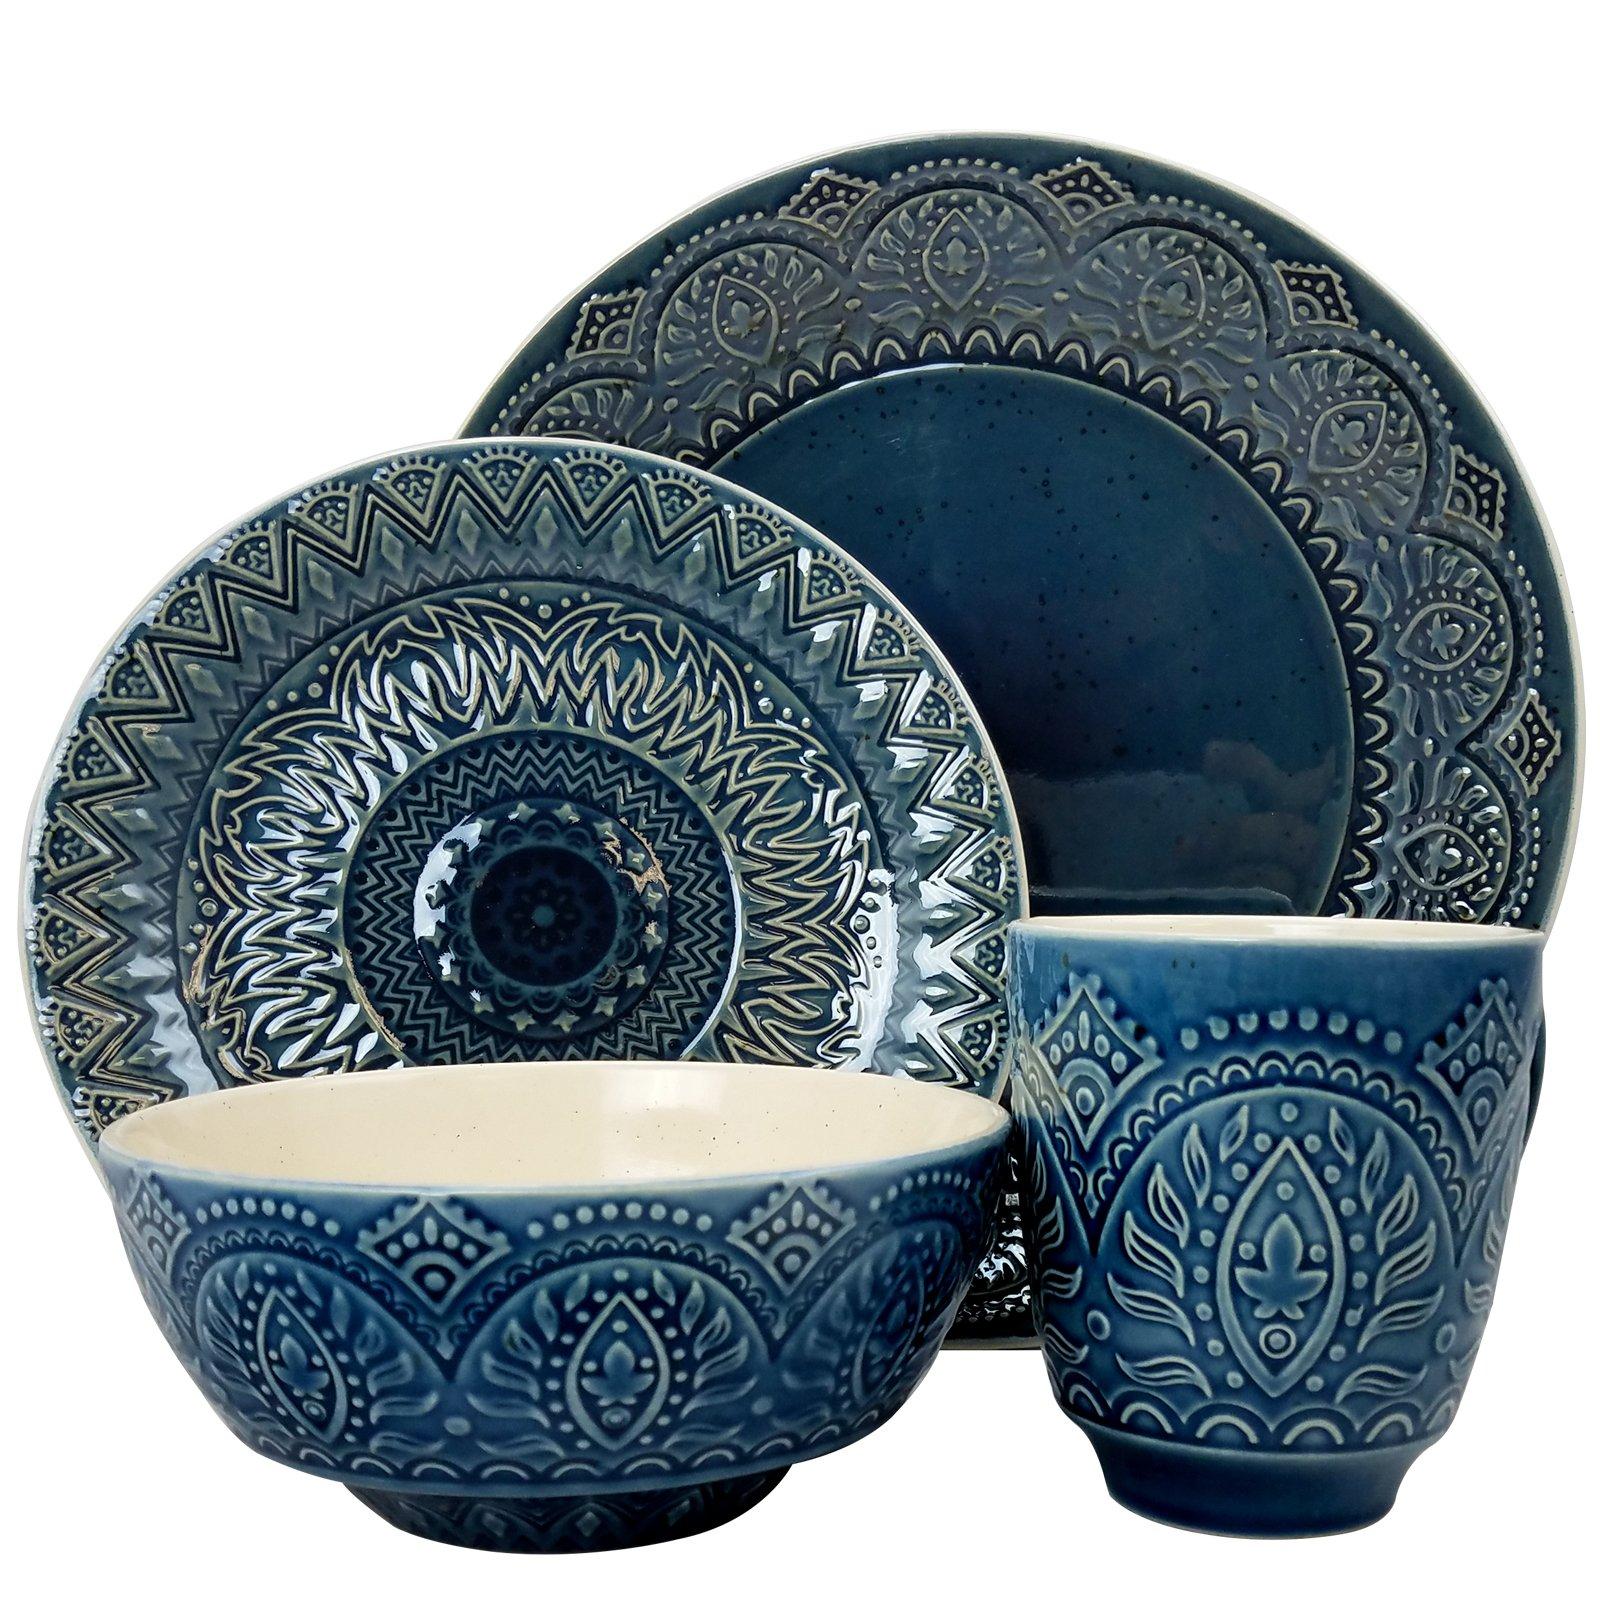 Elama ELM-PETRA 16 Piece Stoneware Dinnerware, 16pc set